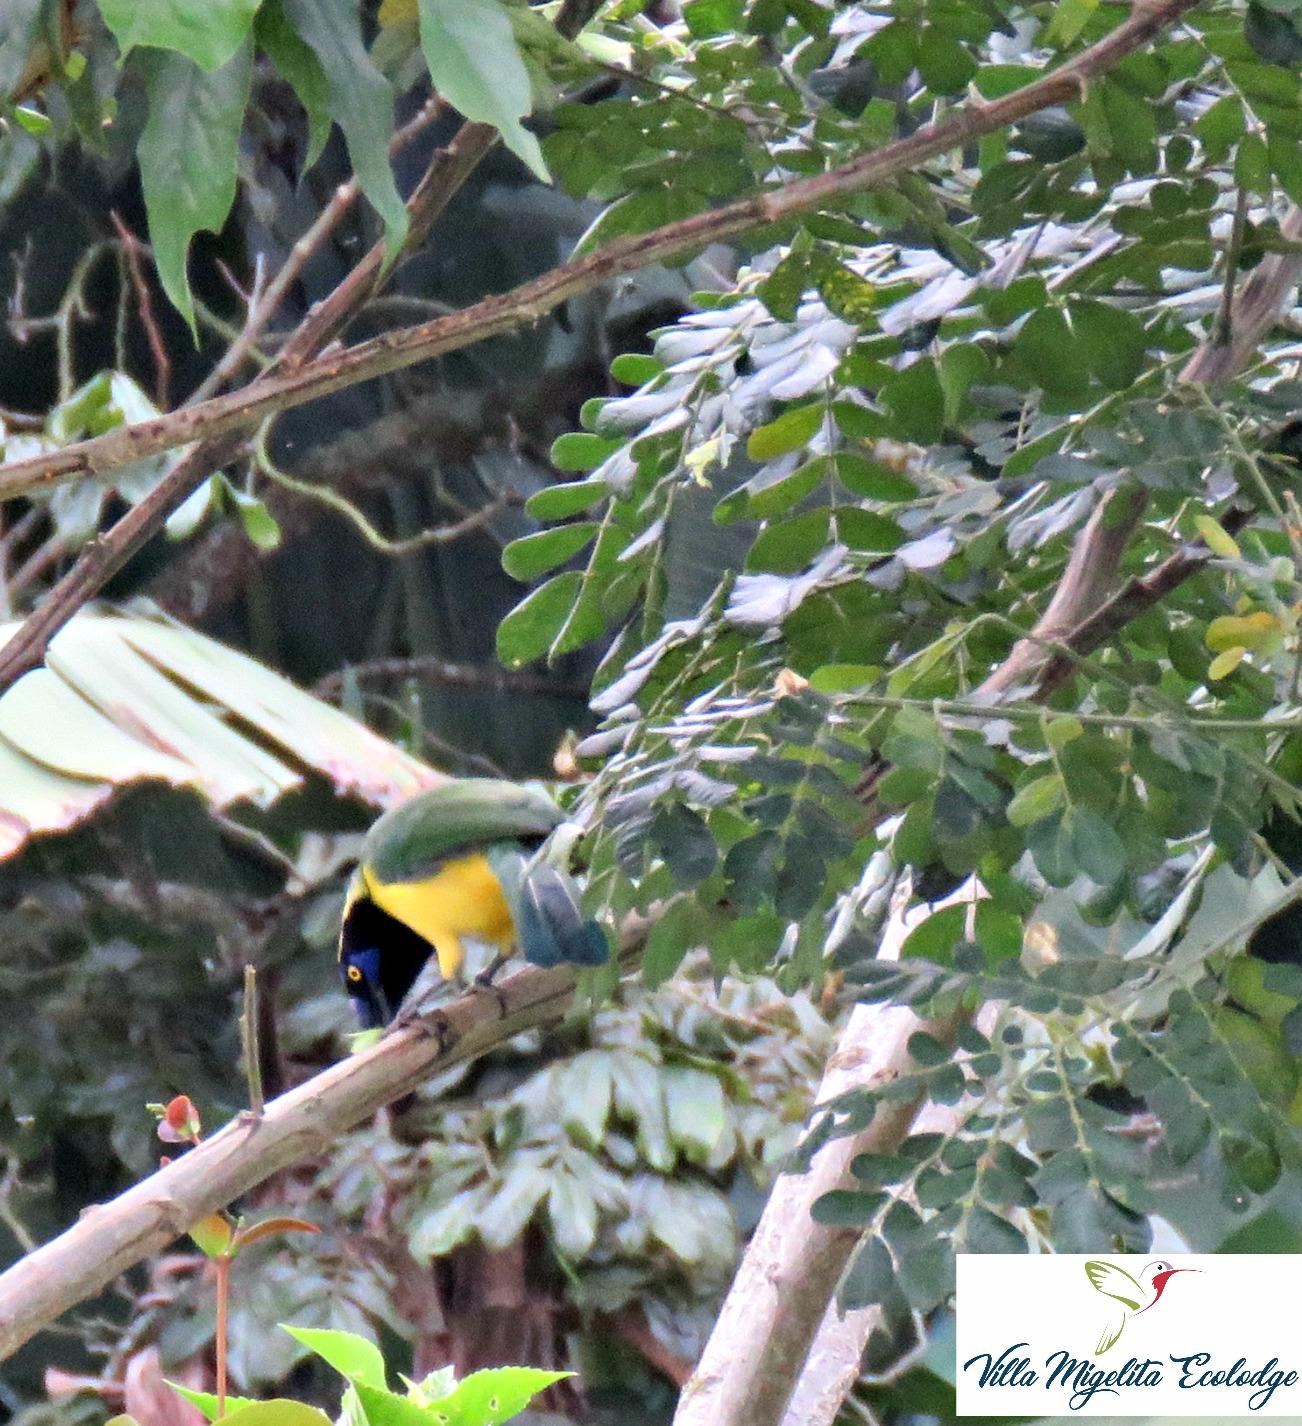 Hummingbirds and Cariqui bird 004